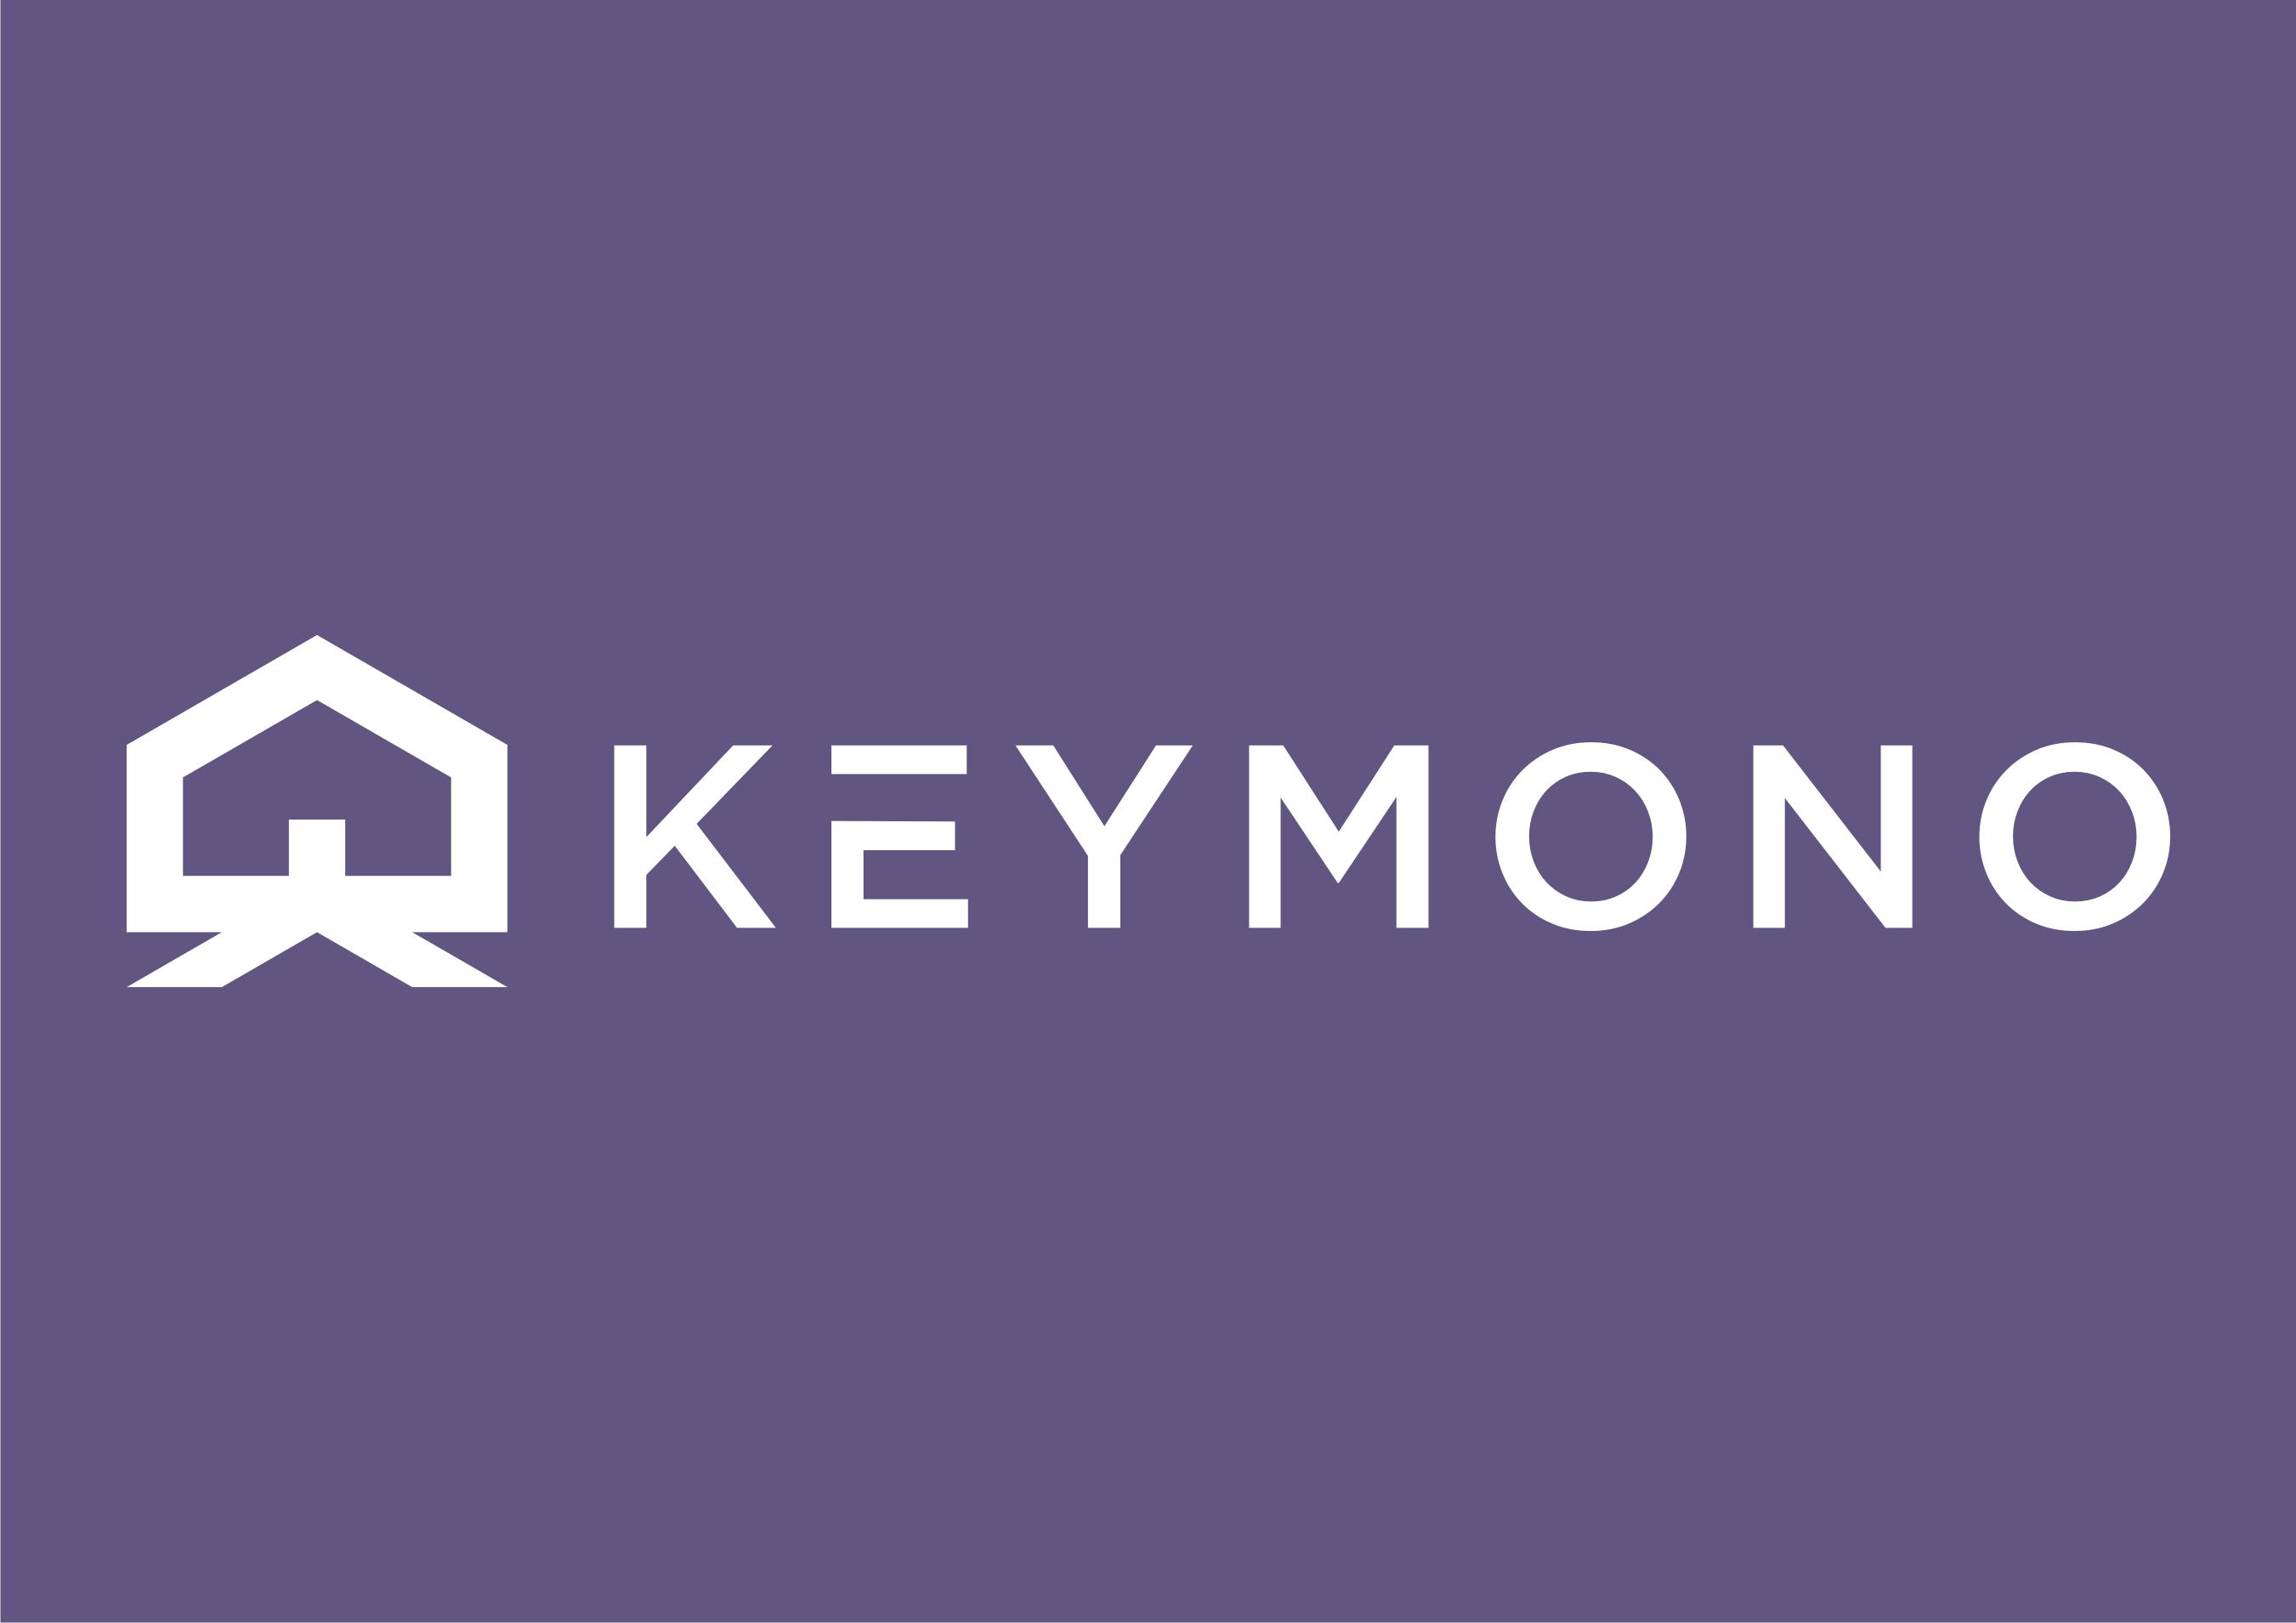 Keymono